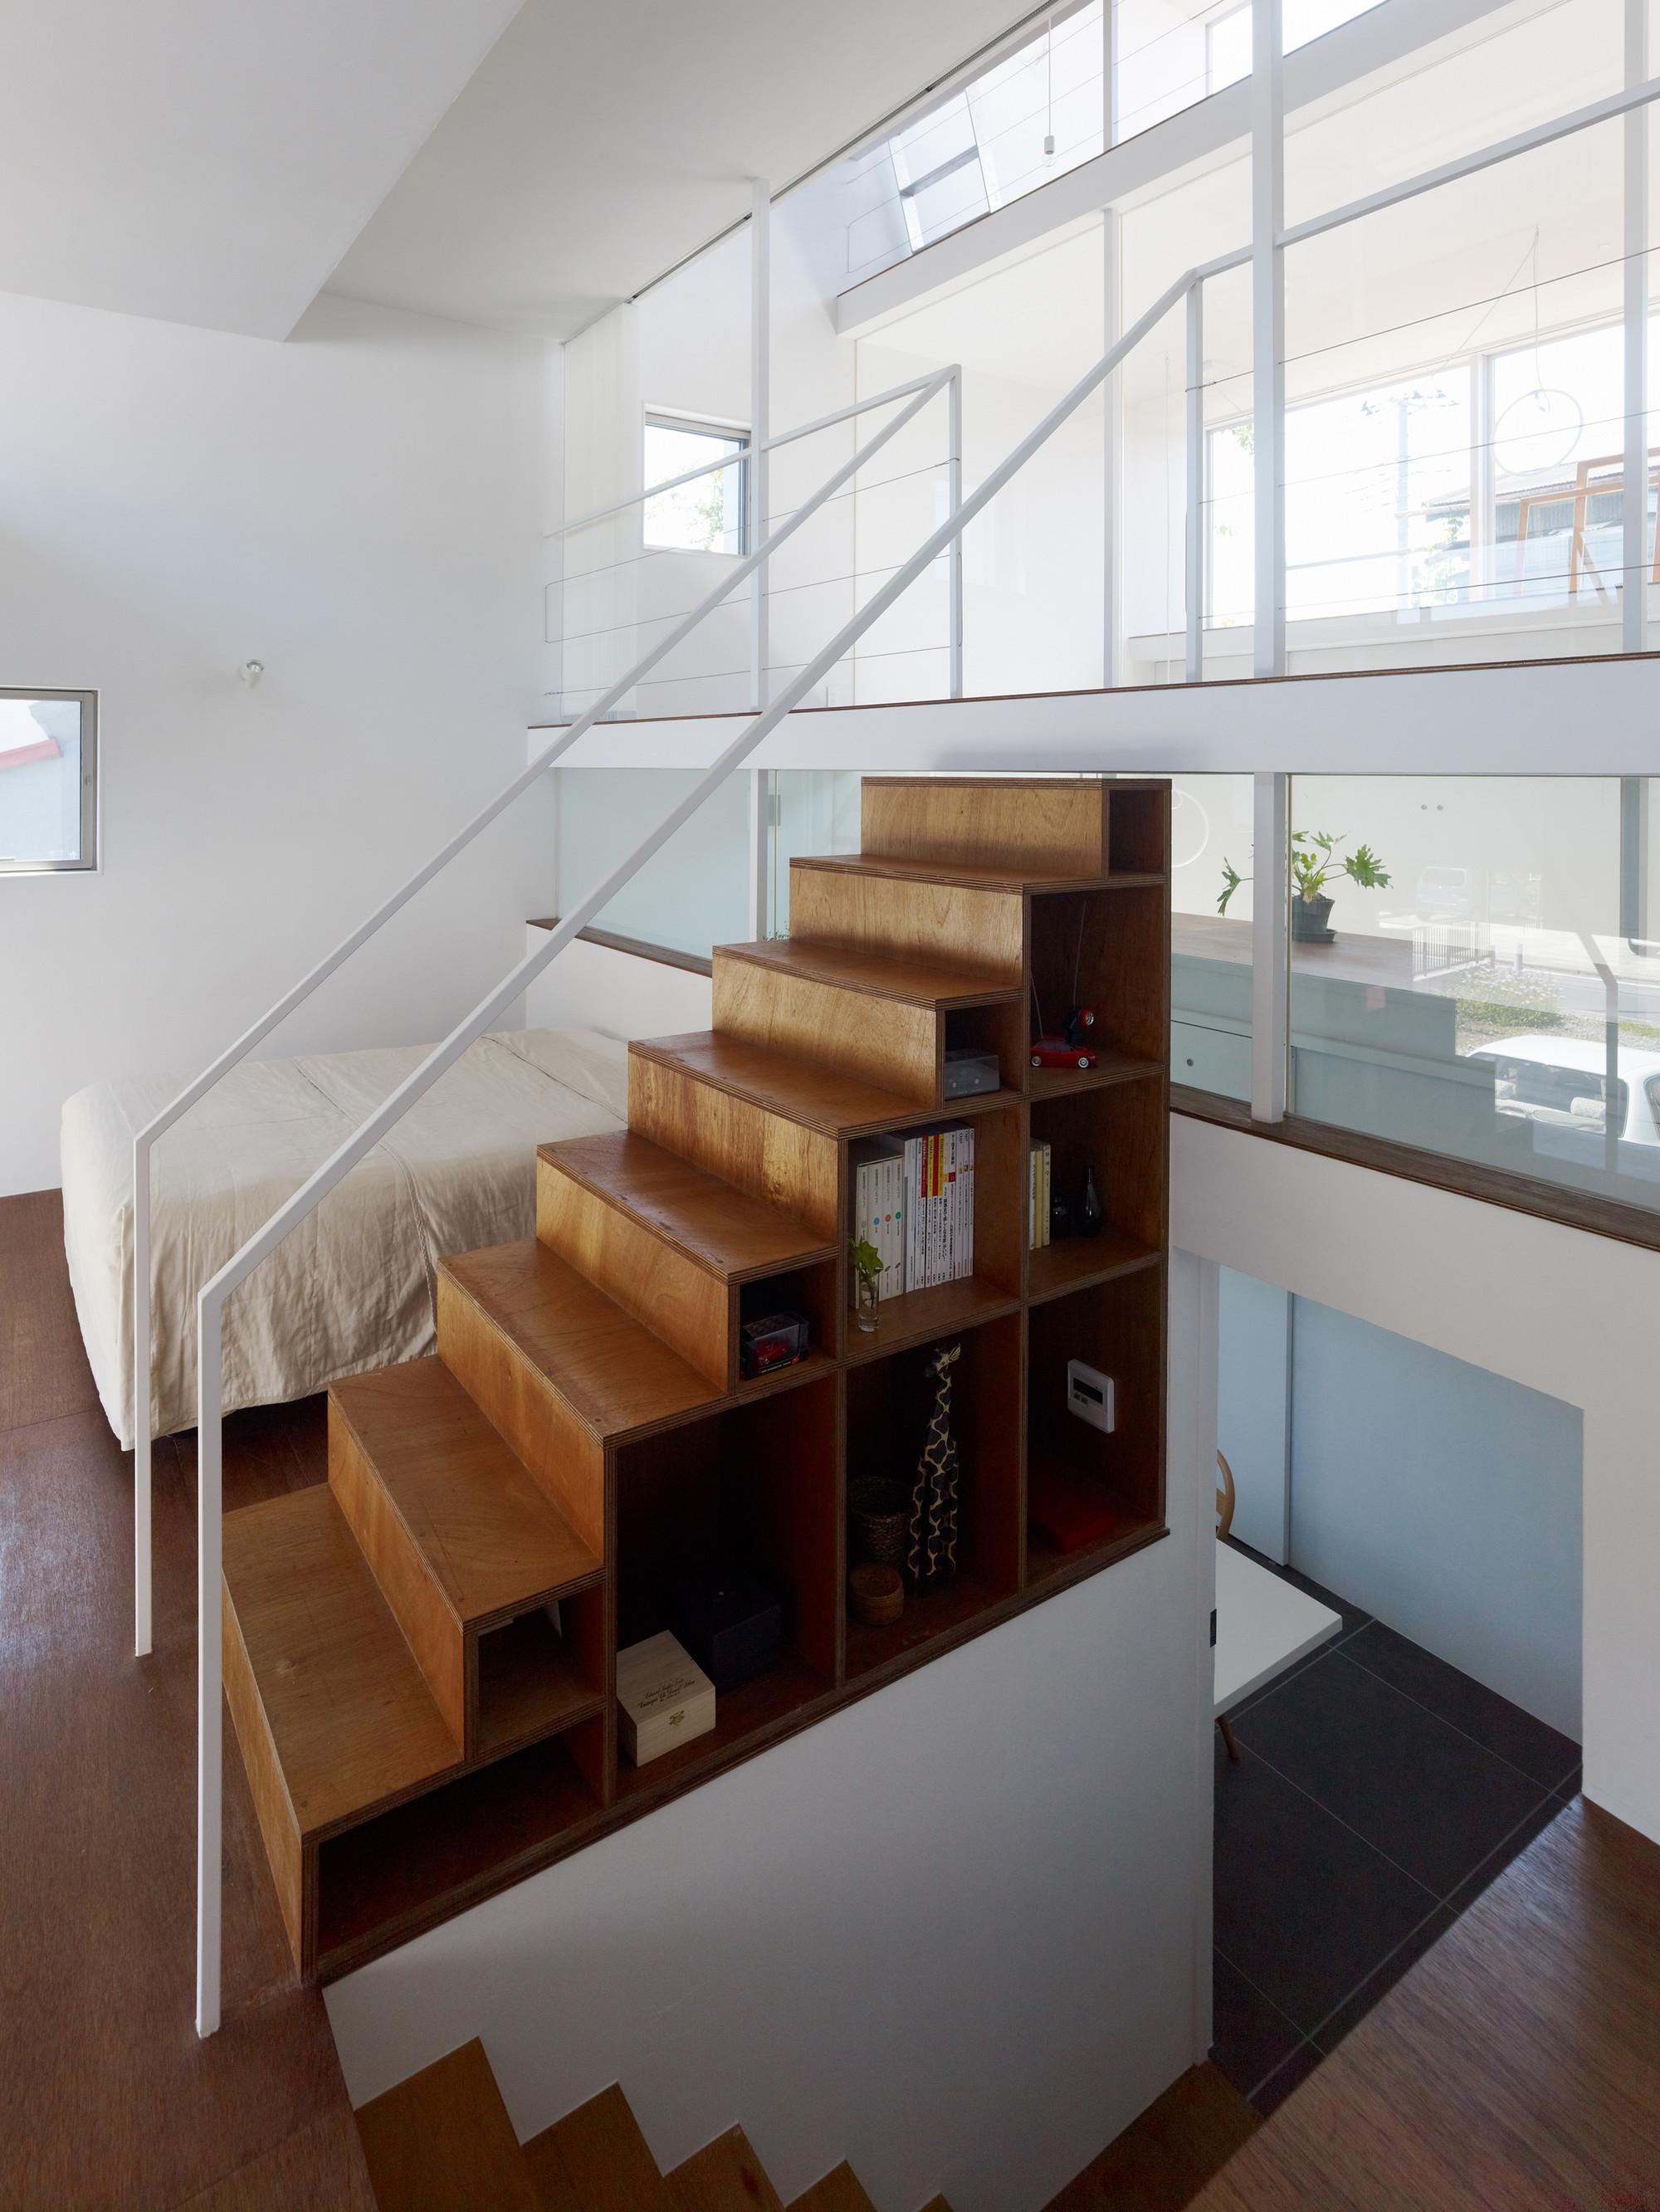 Gallery of amida house kochi architect 39 s studio 8 for Amida house istanbul